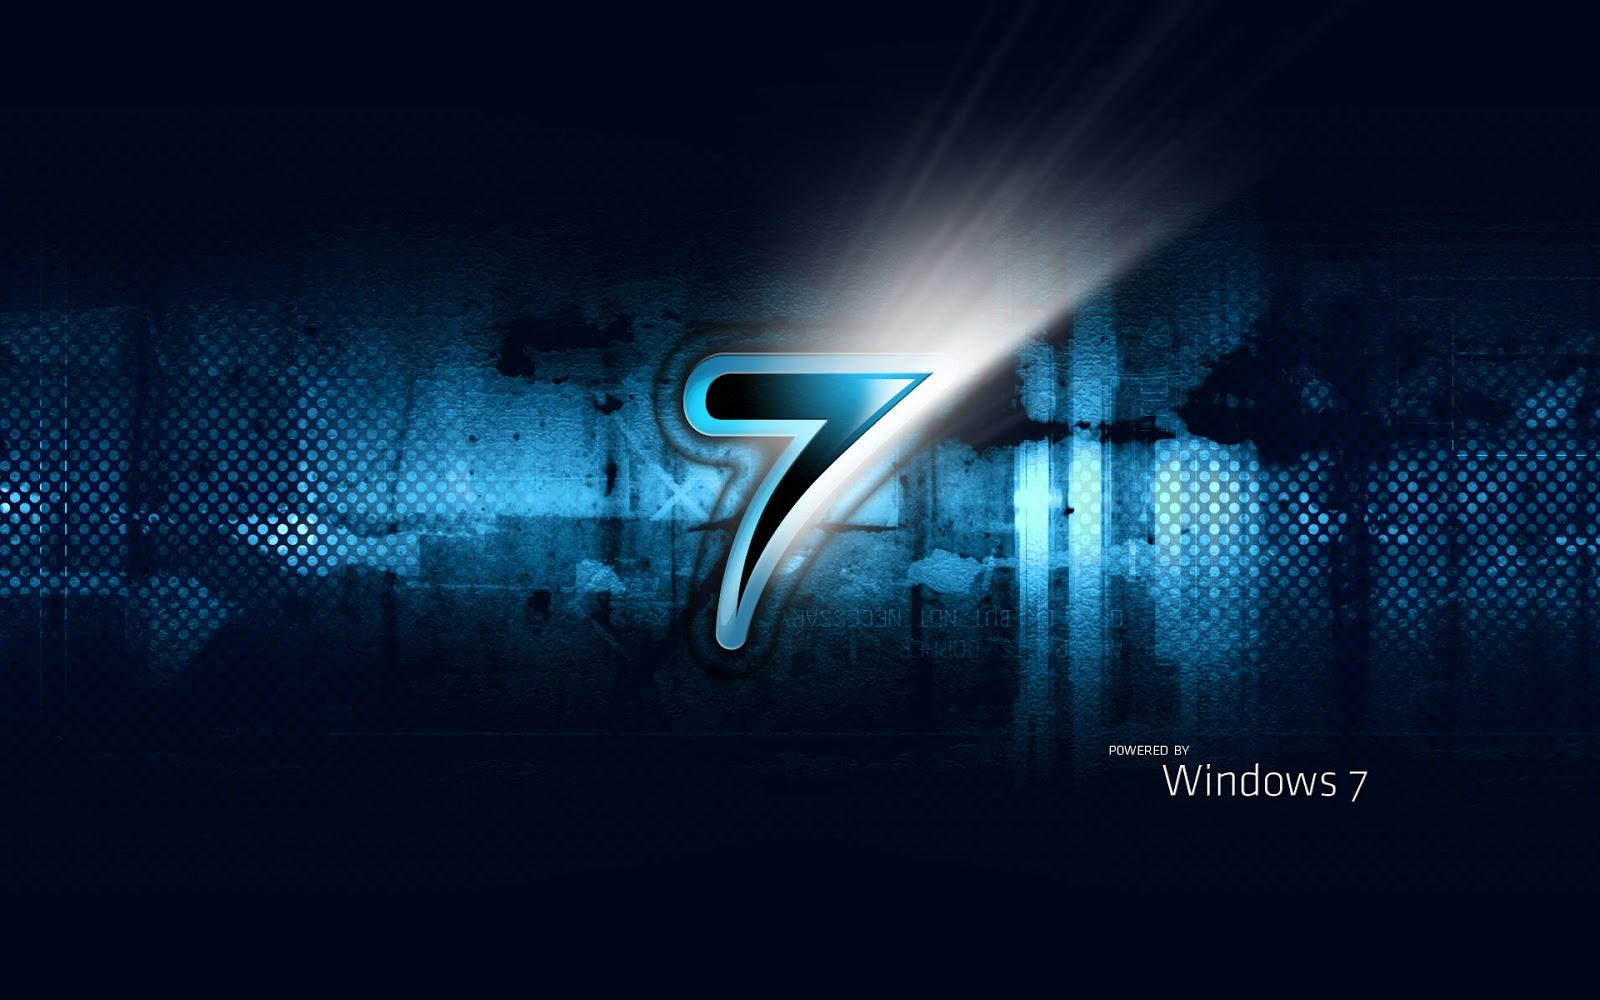 download 100 wallpaper windows